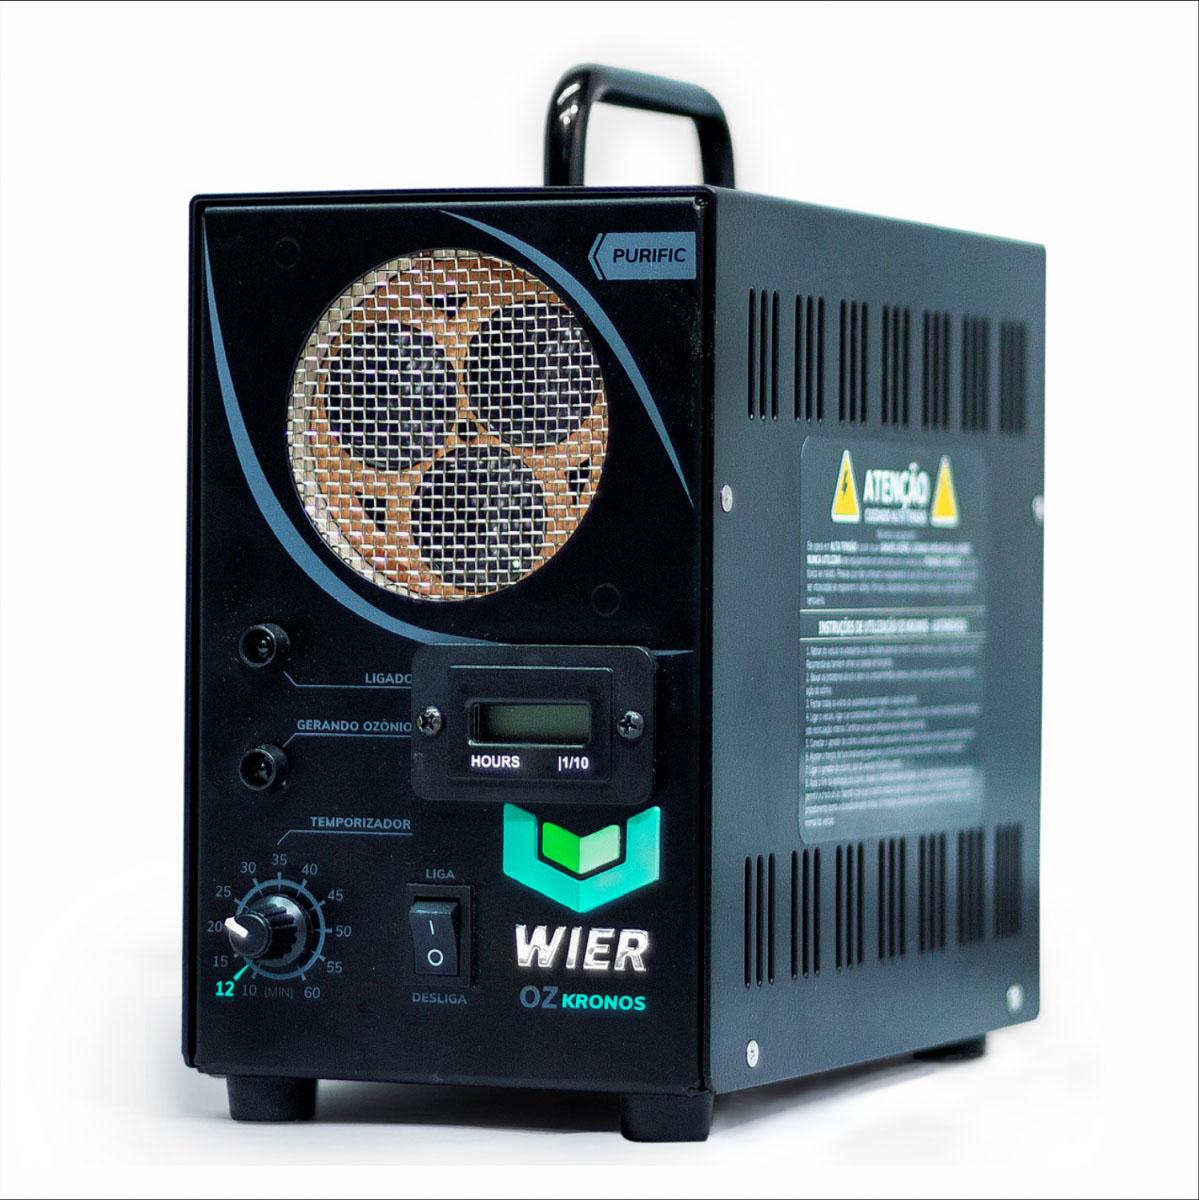 Gerador de Ozônio OZ Kronos - Wier